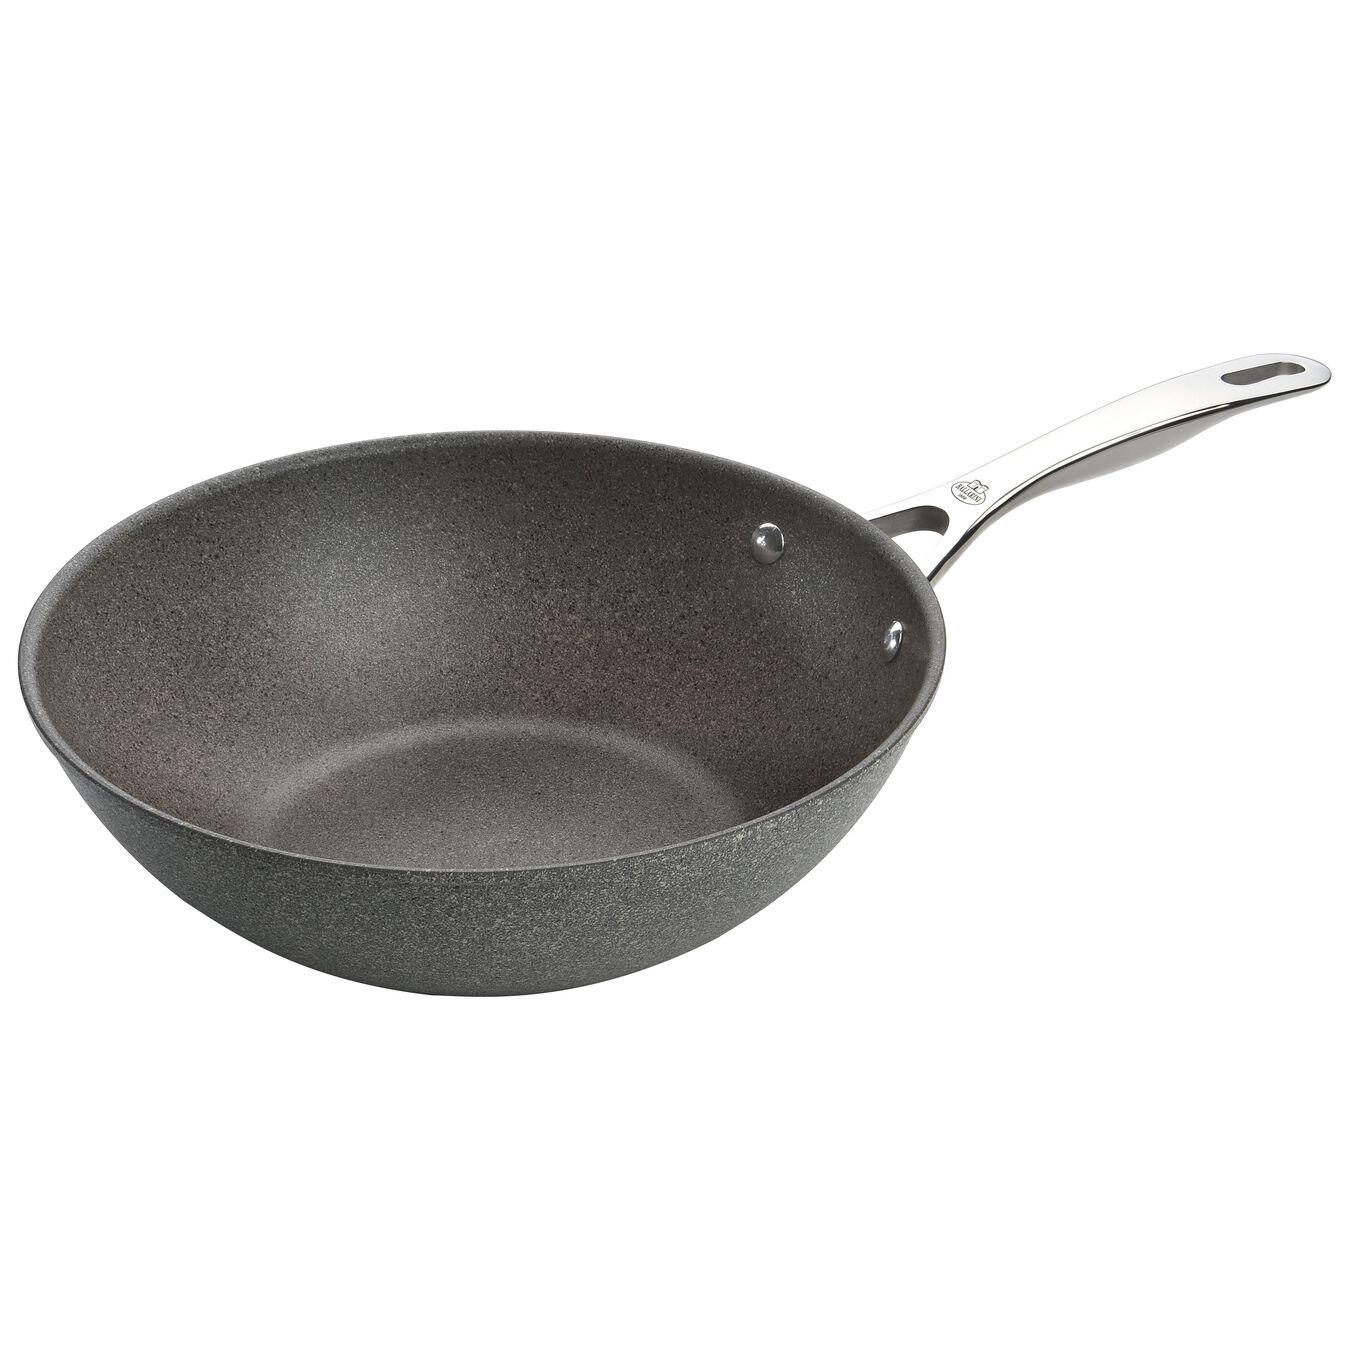 Wok 30 cm, Aluminium,,large 1